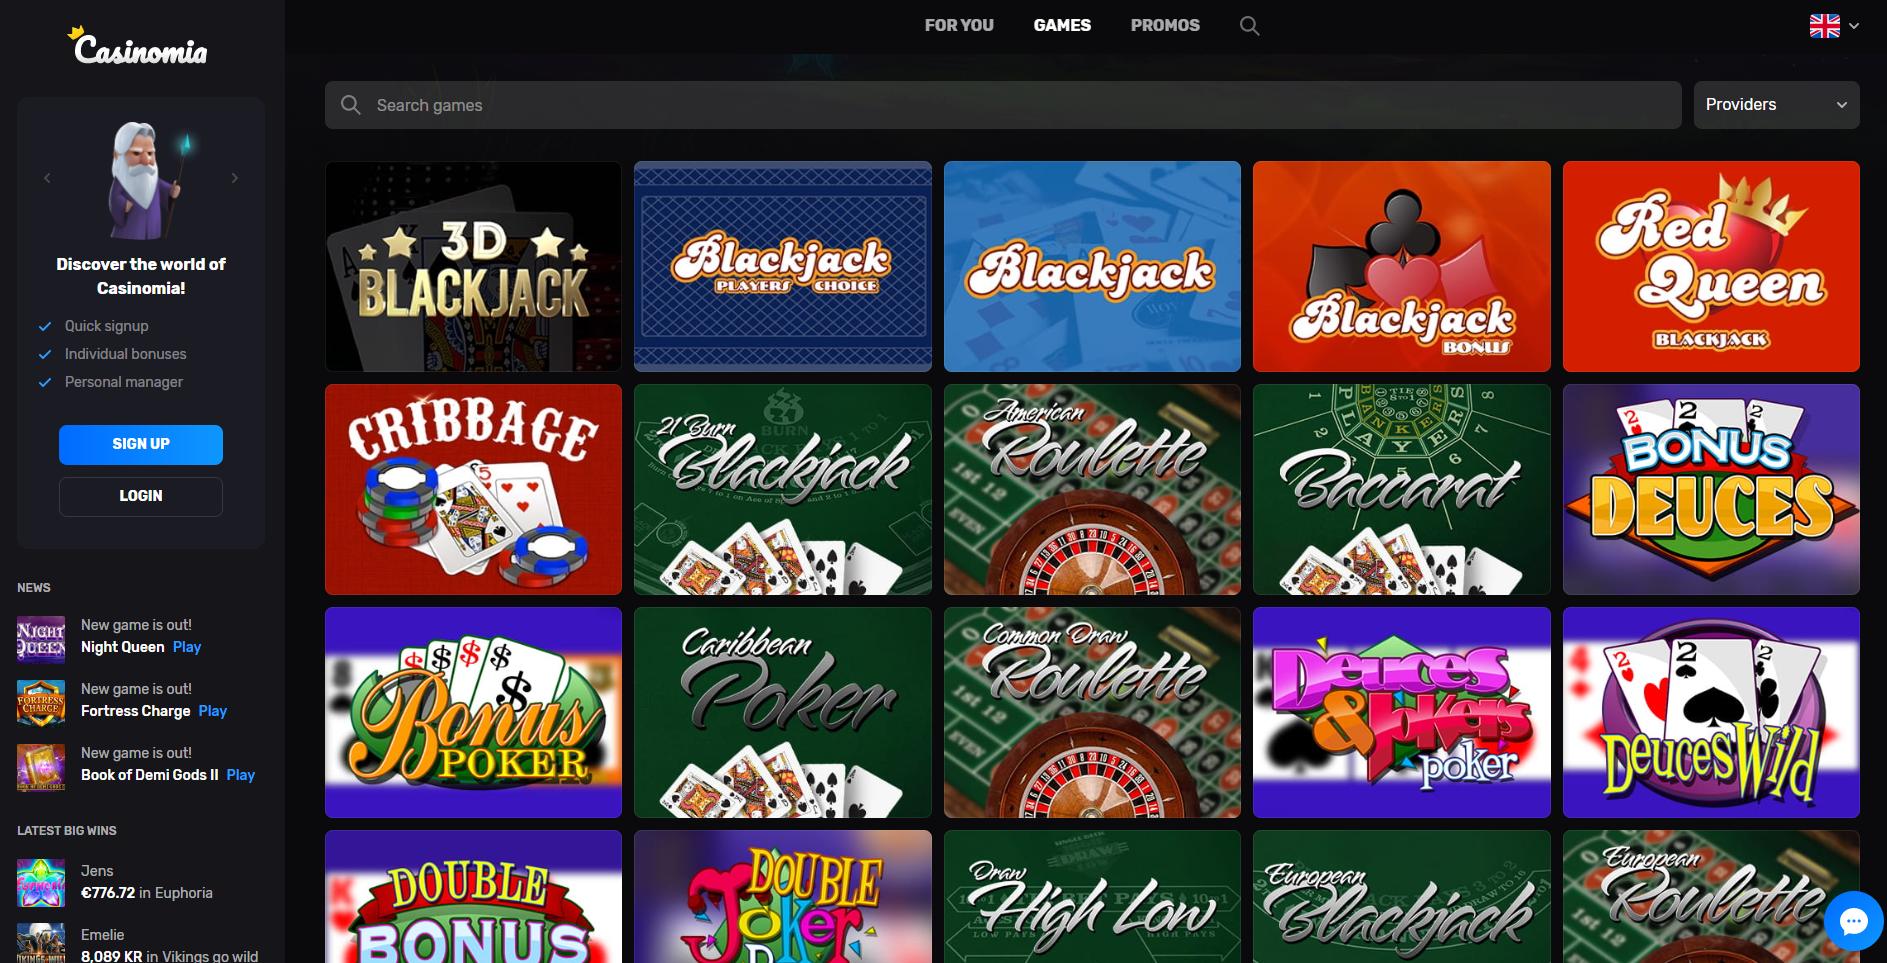 casinomia table games stalo žaidimai - blackjack baccarat roulette bonus poker caribbean poker deuces wild